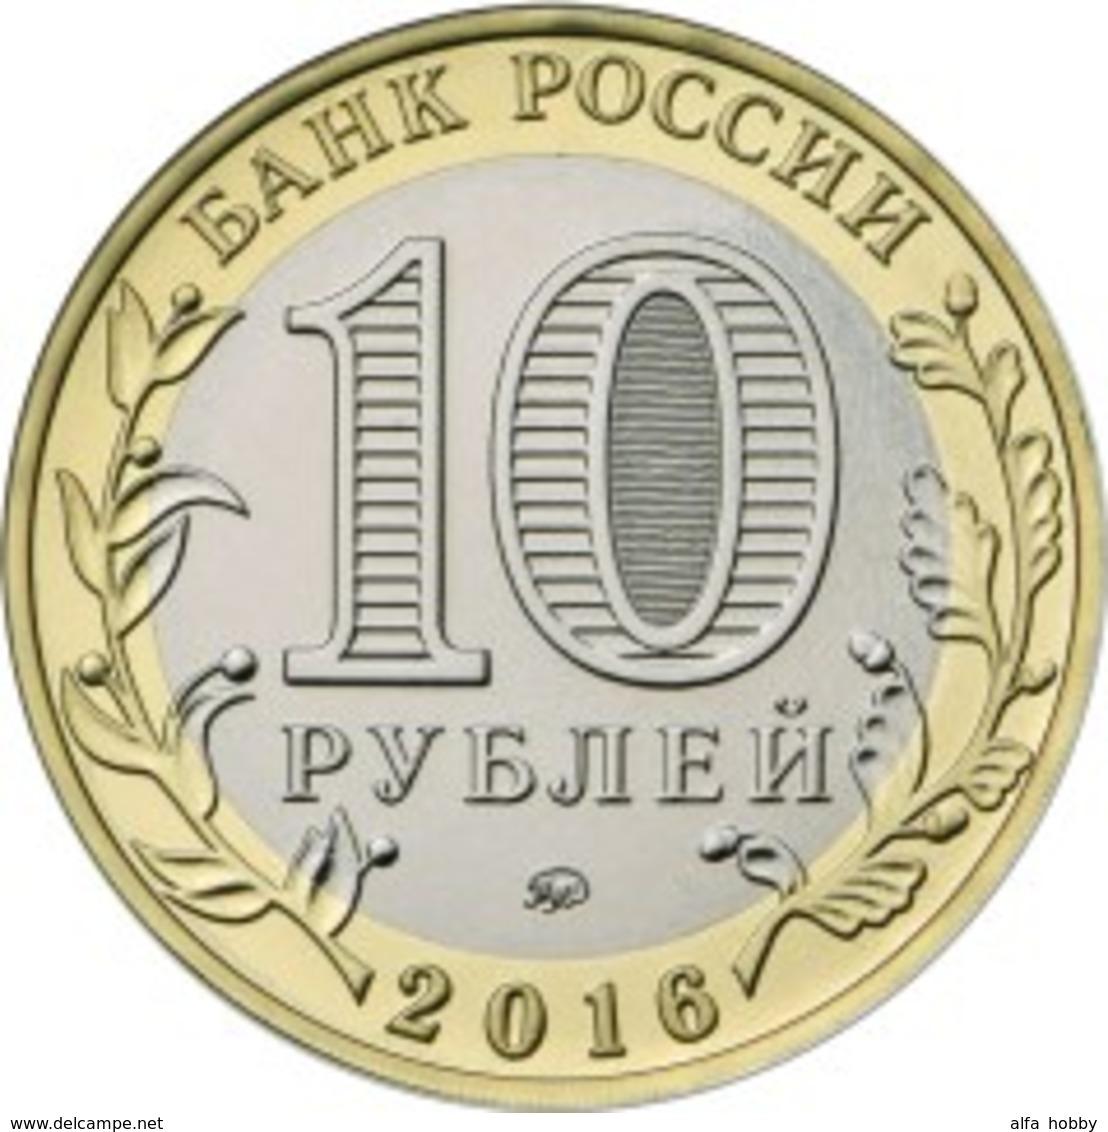 Russia, Irkutsk Region 2016 10 Rbl Rubels Rubles Bi-metallic Uncirculated - Russland